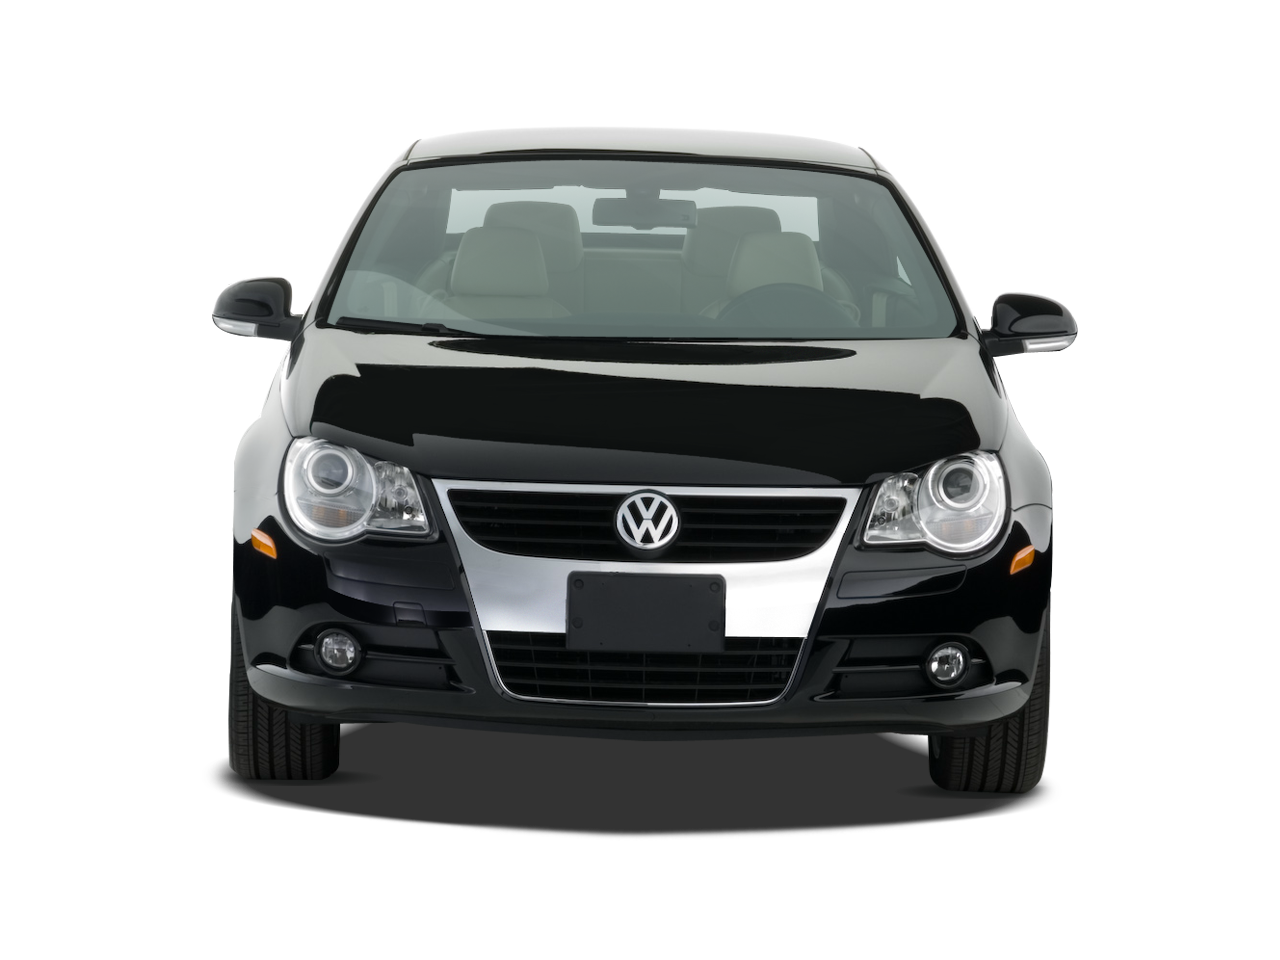 2007 volkswagen eos new car review automobile magazine. Black Bedroom Furniture Sets. Home Design Ideas